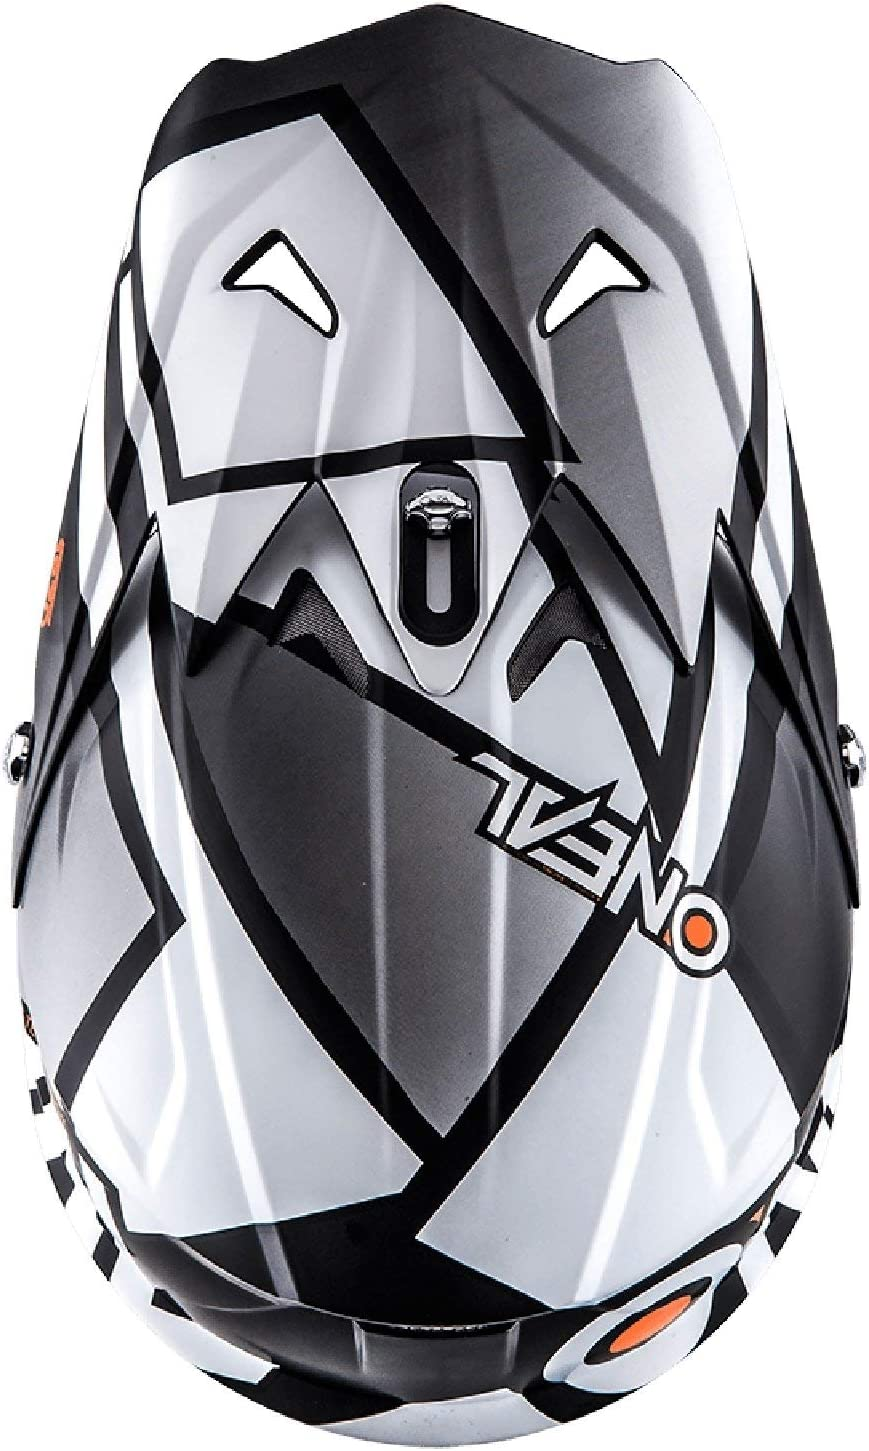 0623-63 ONeal 3Series MX Helm Radium Schwarz Wei/ß Motocross Enduro Quad Offroad Cross